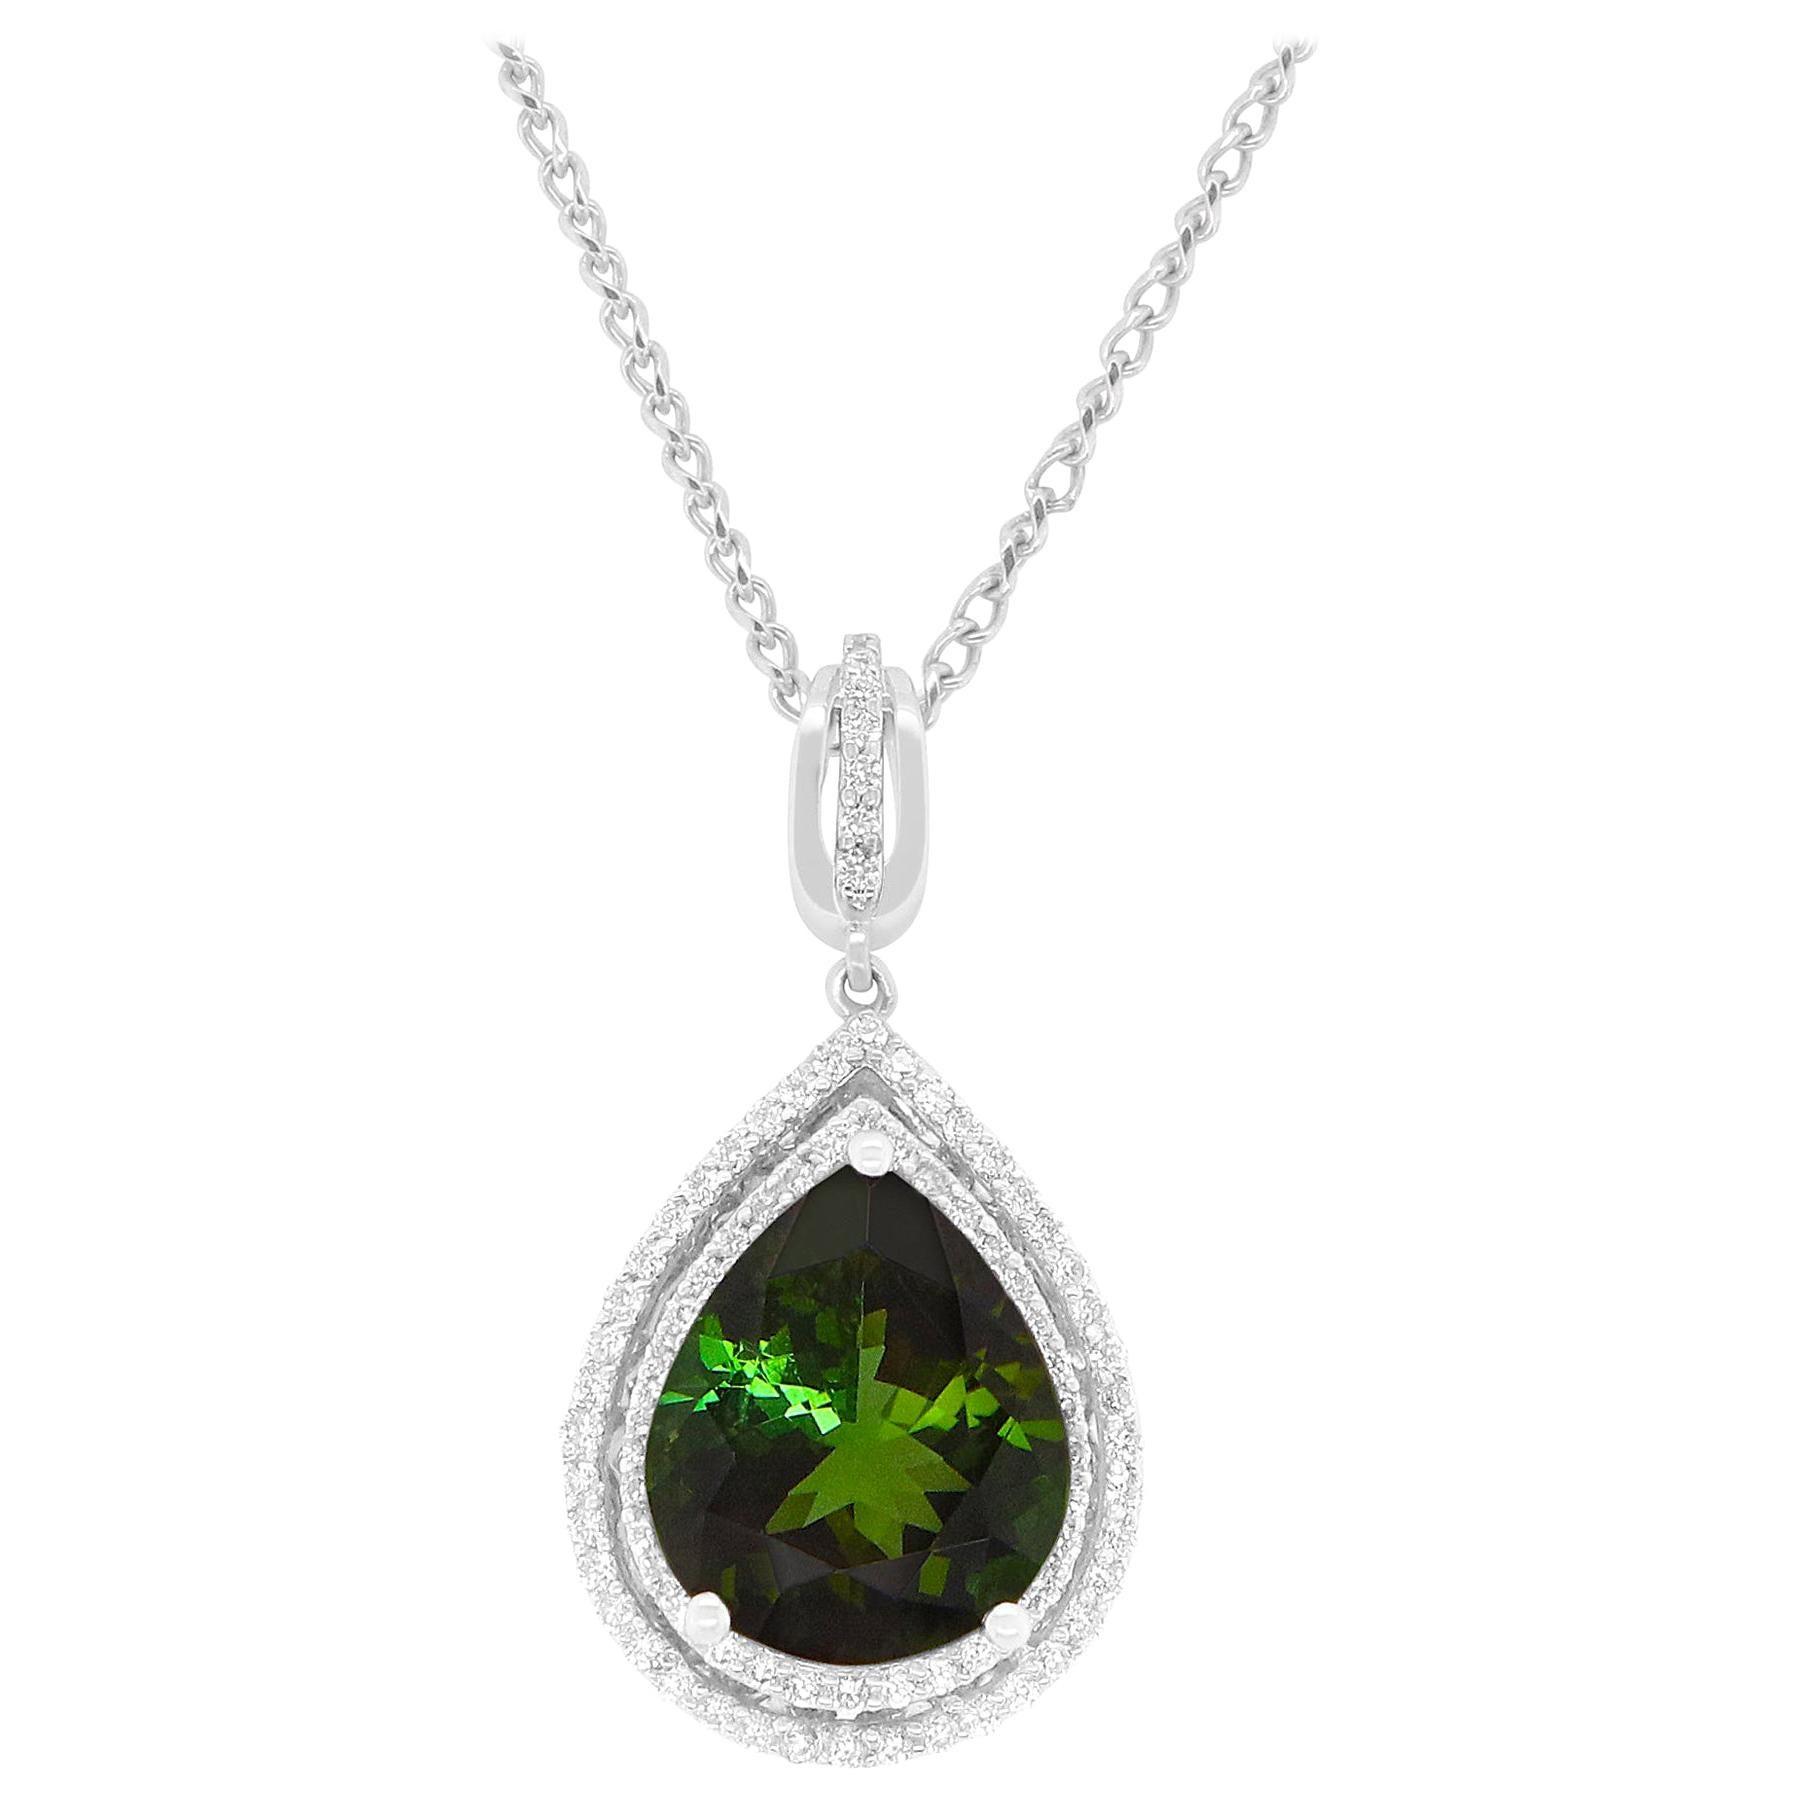 4.13 Carat Green Tourmaline and White Diamond Halo Pendant 14 Karat White Gold